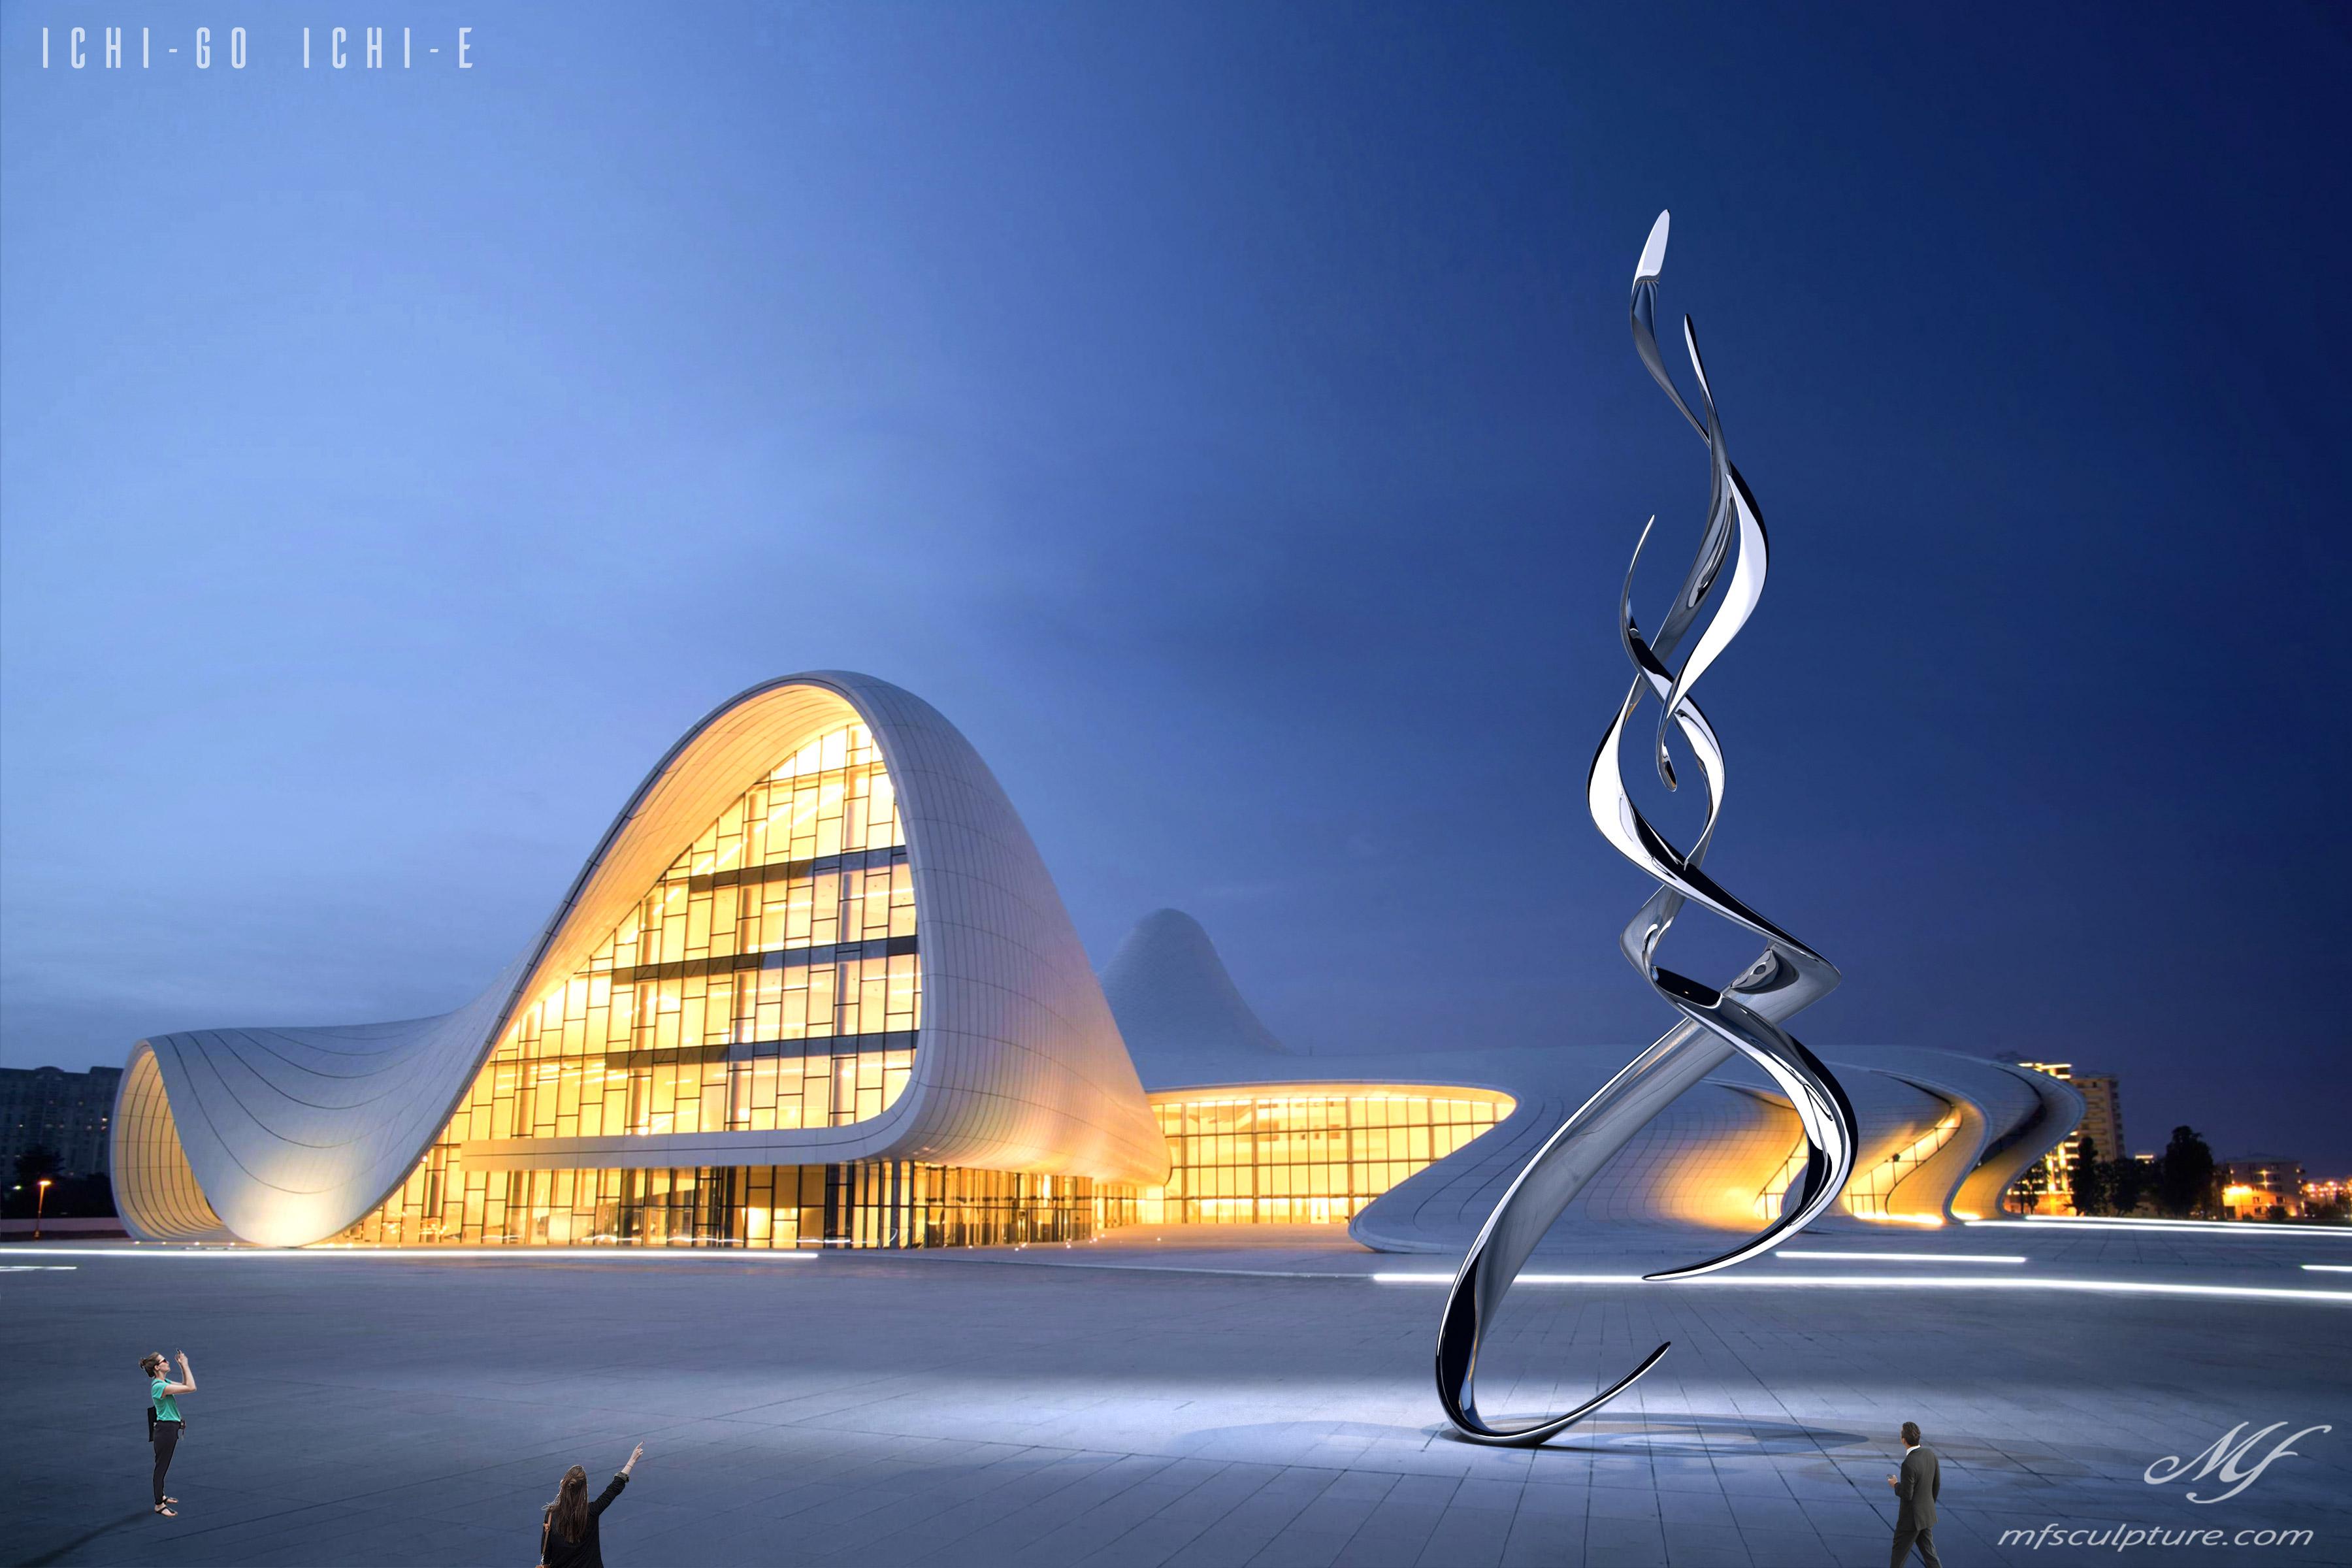 Heydar Aliyev Zaha Hadid Convergence Modern Sculpture Public Art Contemporary Ichi go ichi e 1